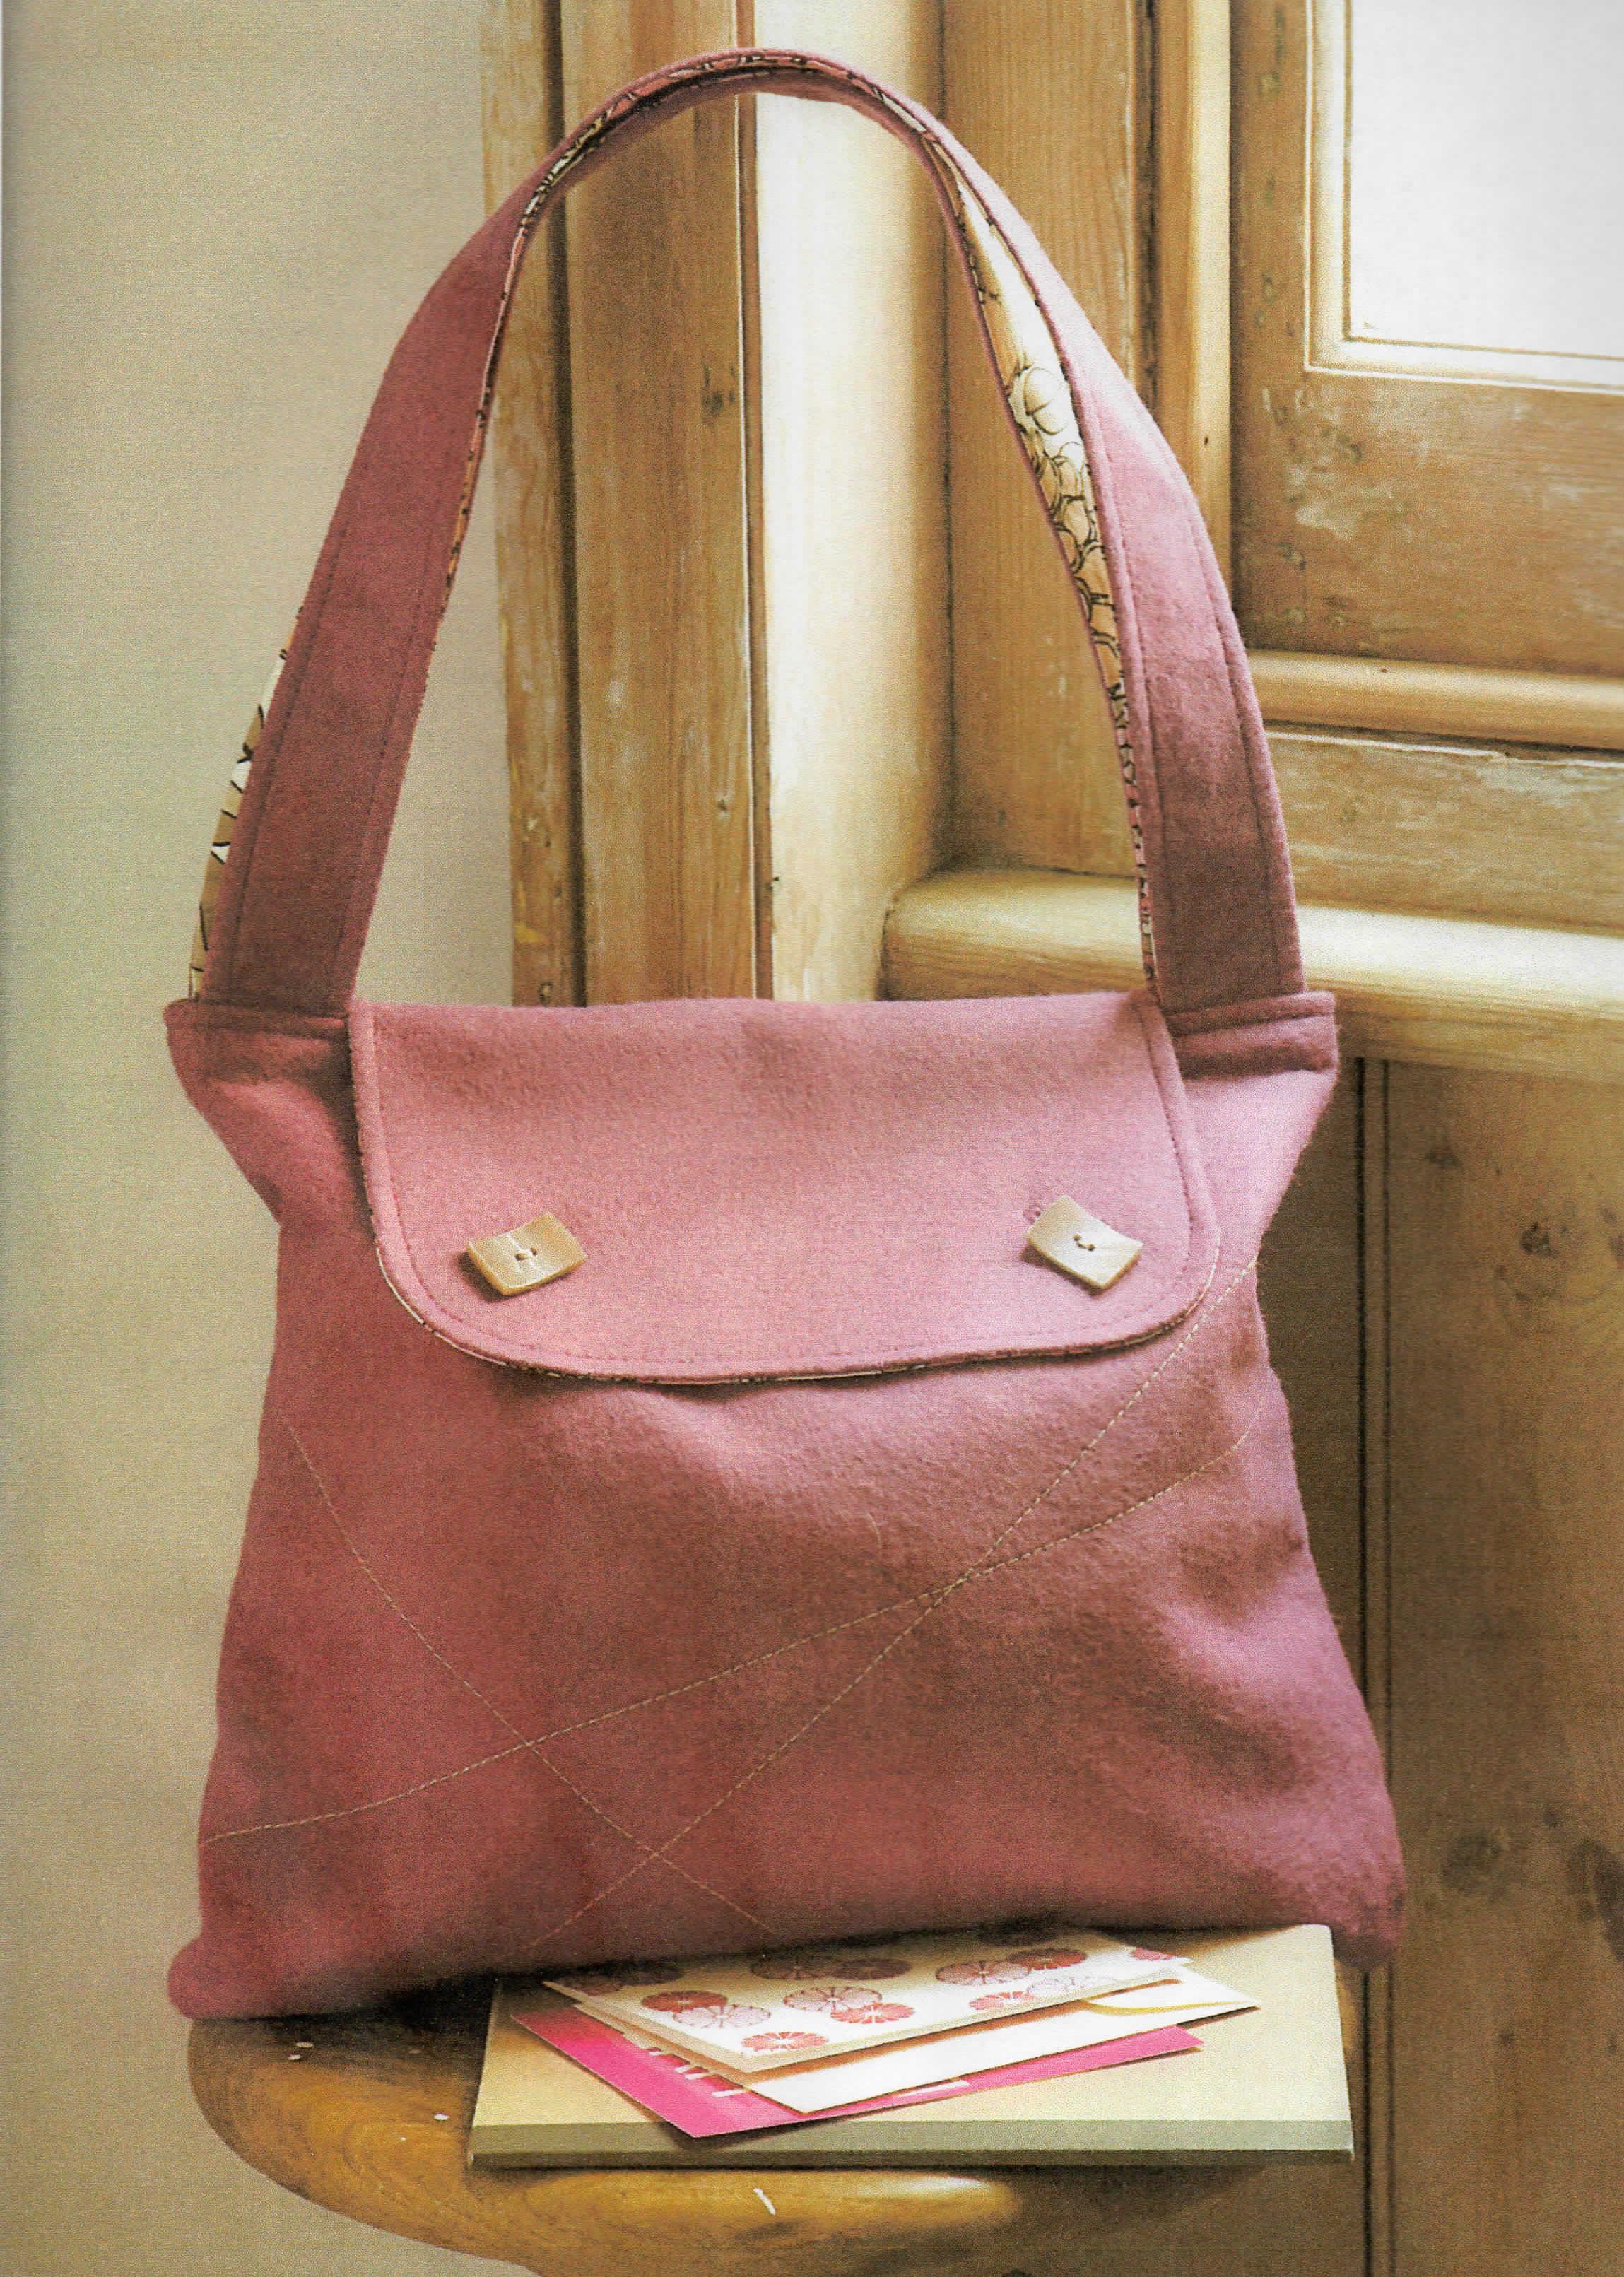 Tote bag Project Fashion